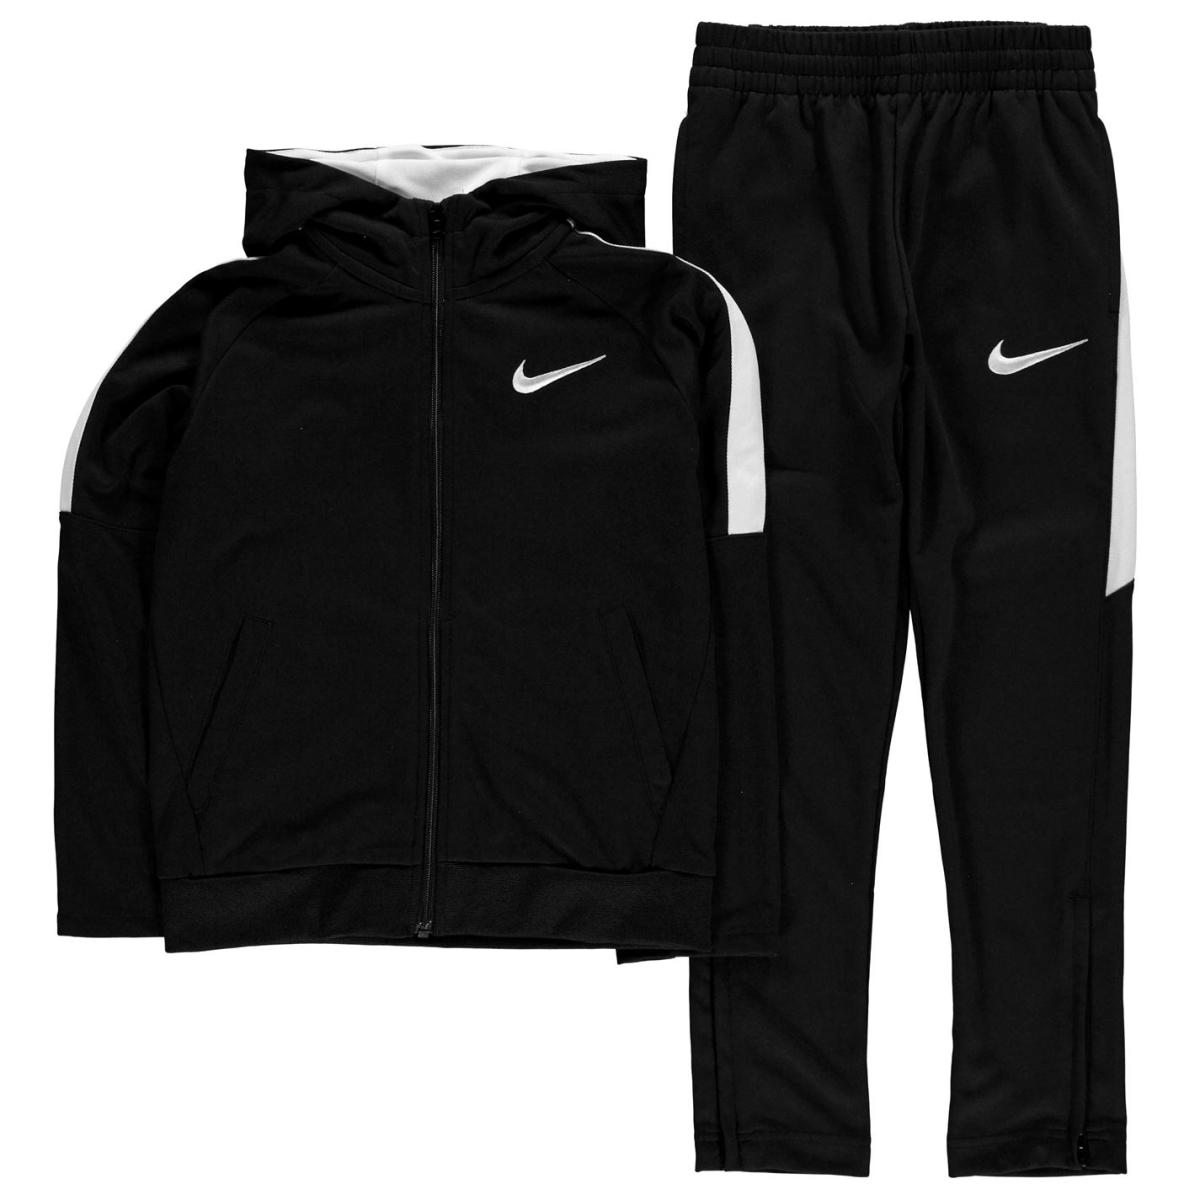 Nike Trainingsanzug Sportanzug Kleinkinder Kinder 8046